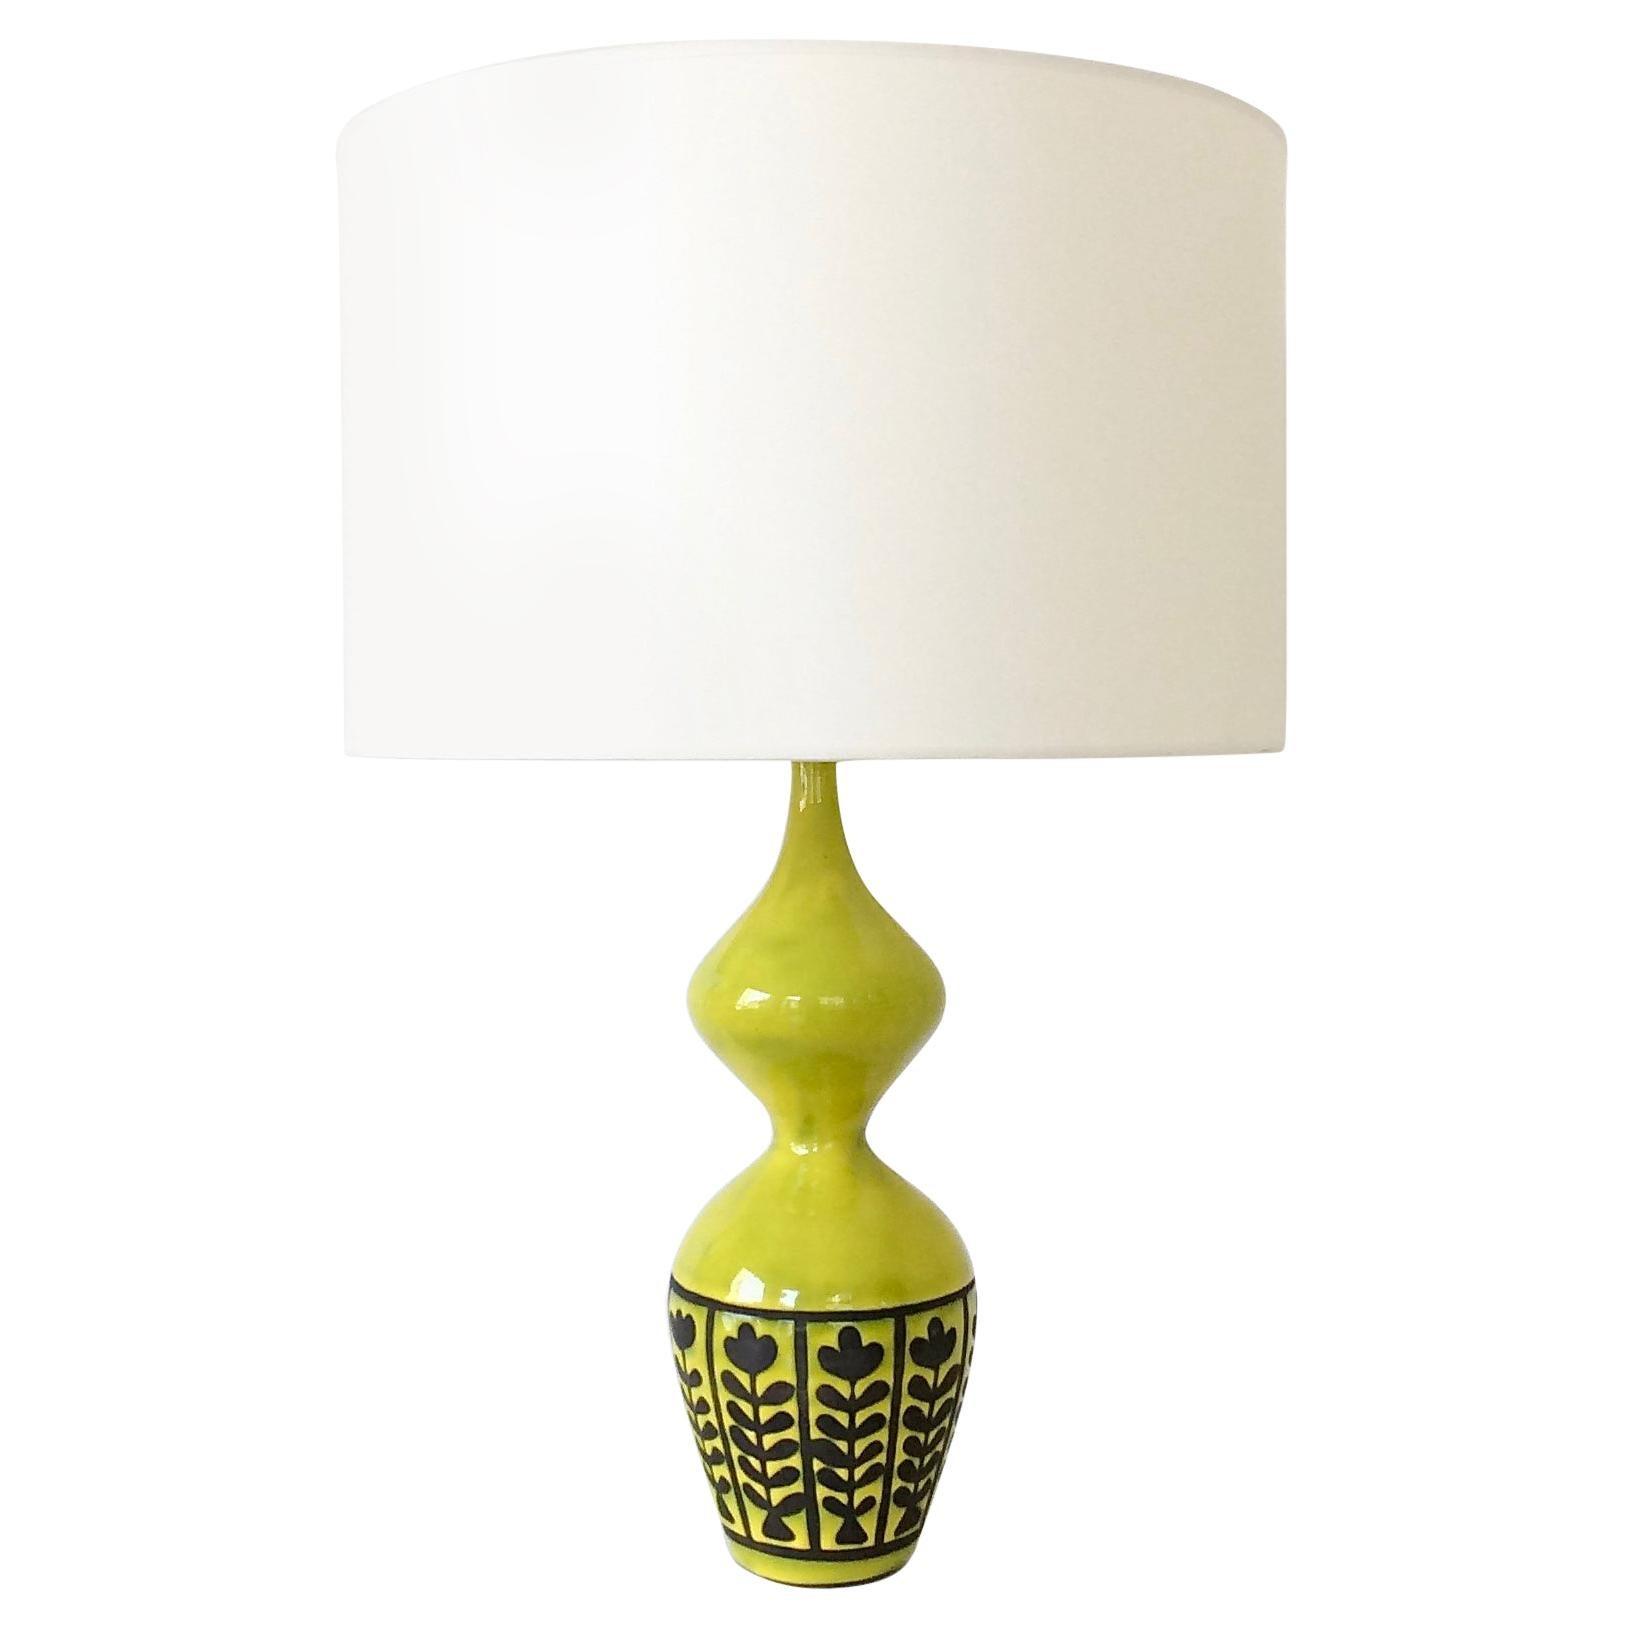 Capron Ceramic Table Lamp, circa 1958, France